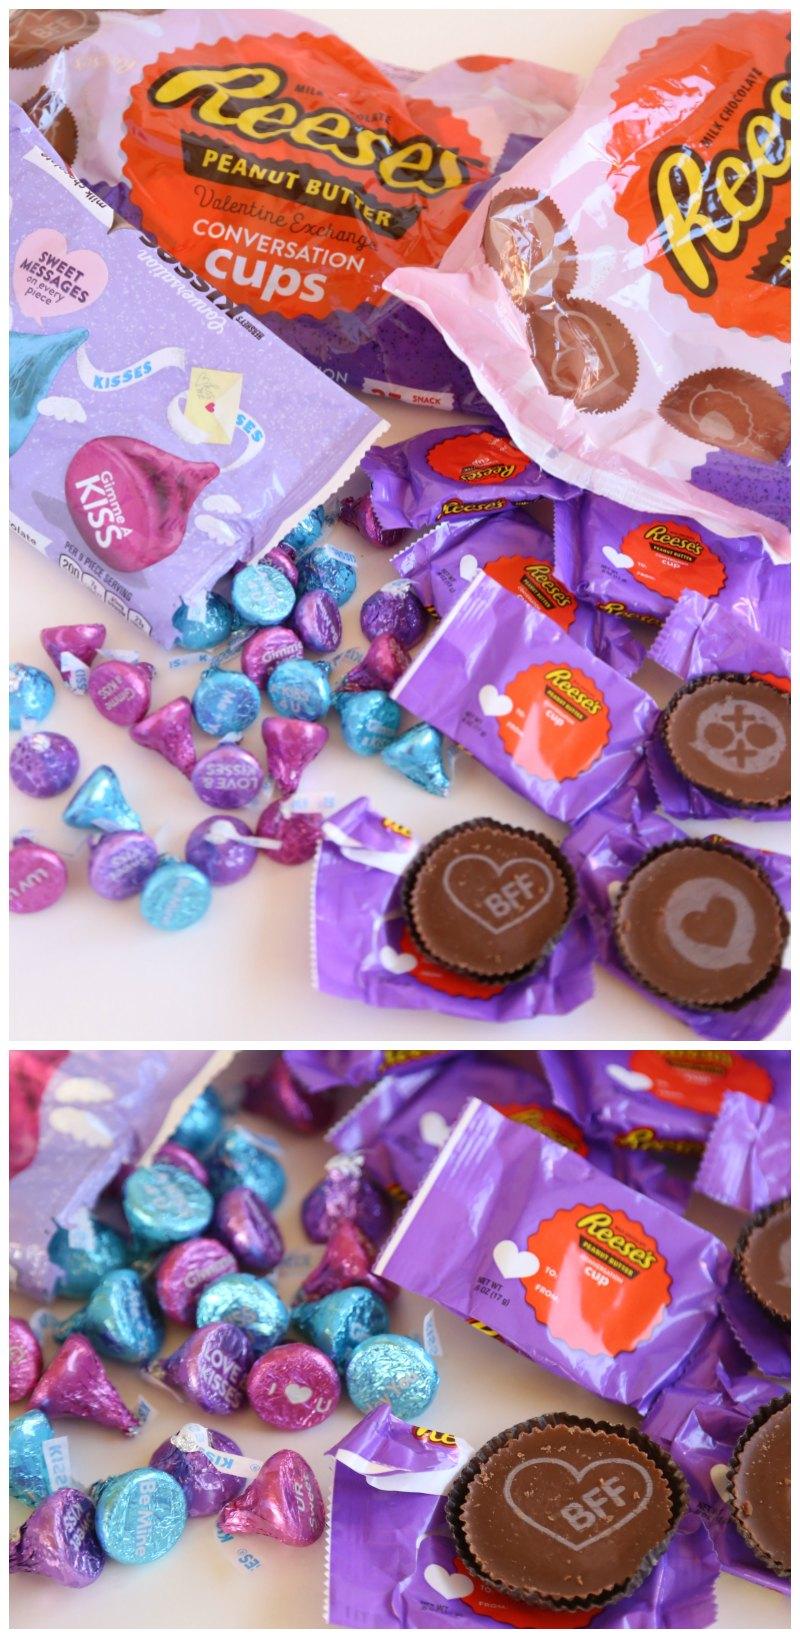 Hershey's Conversation candies